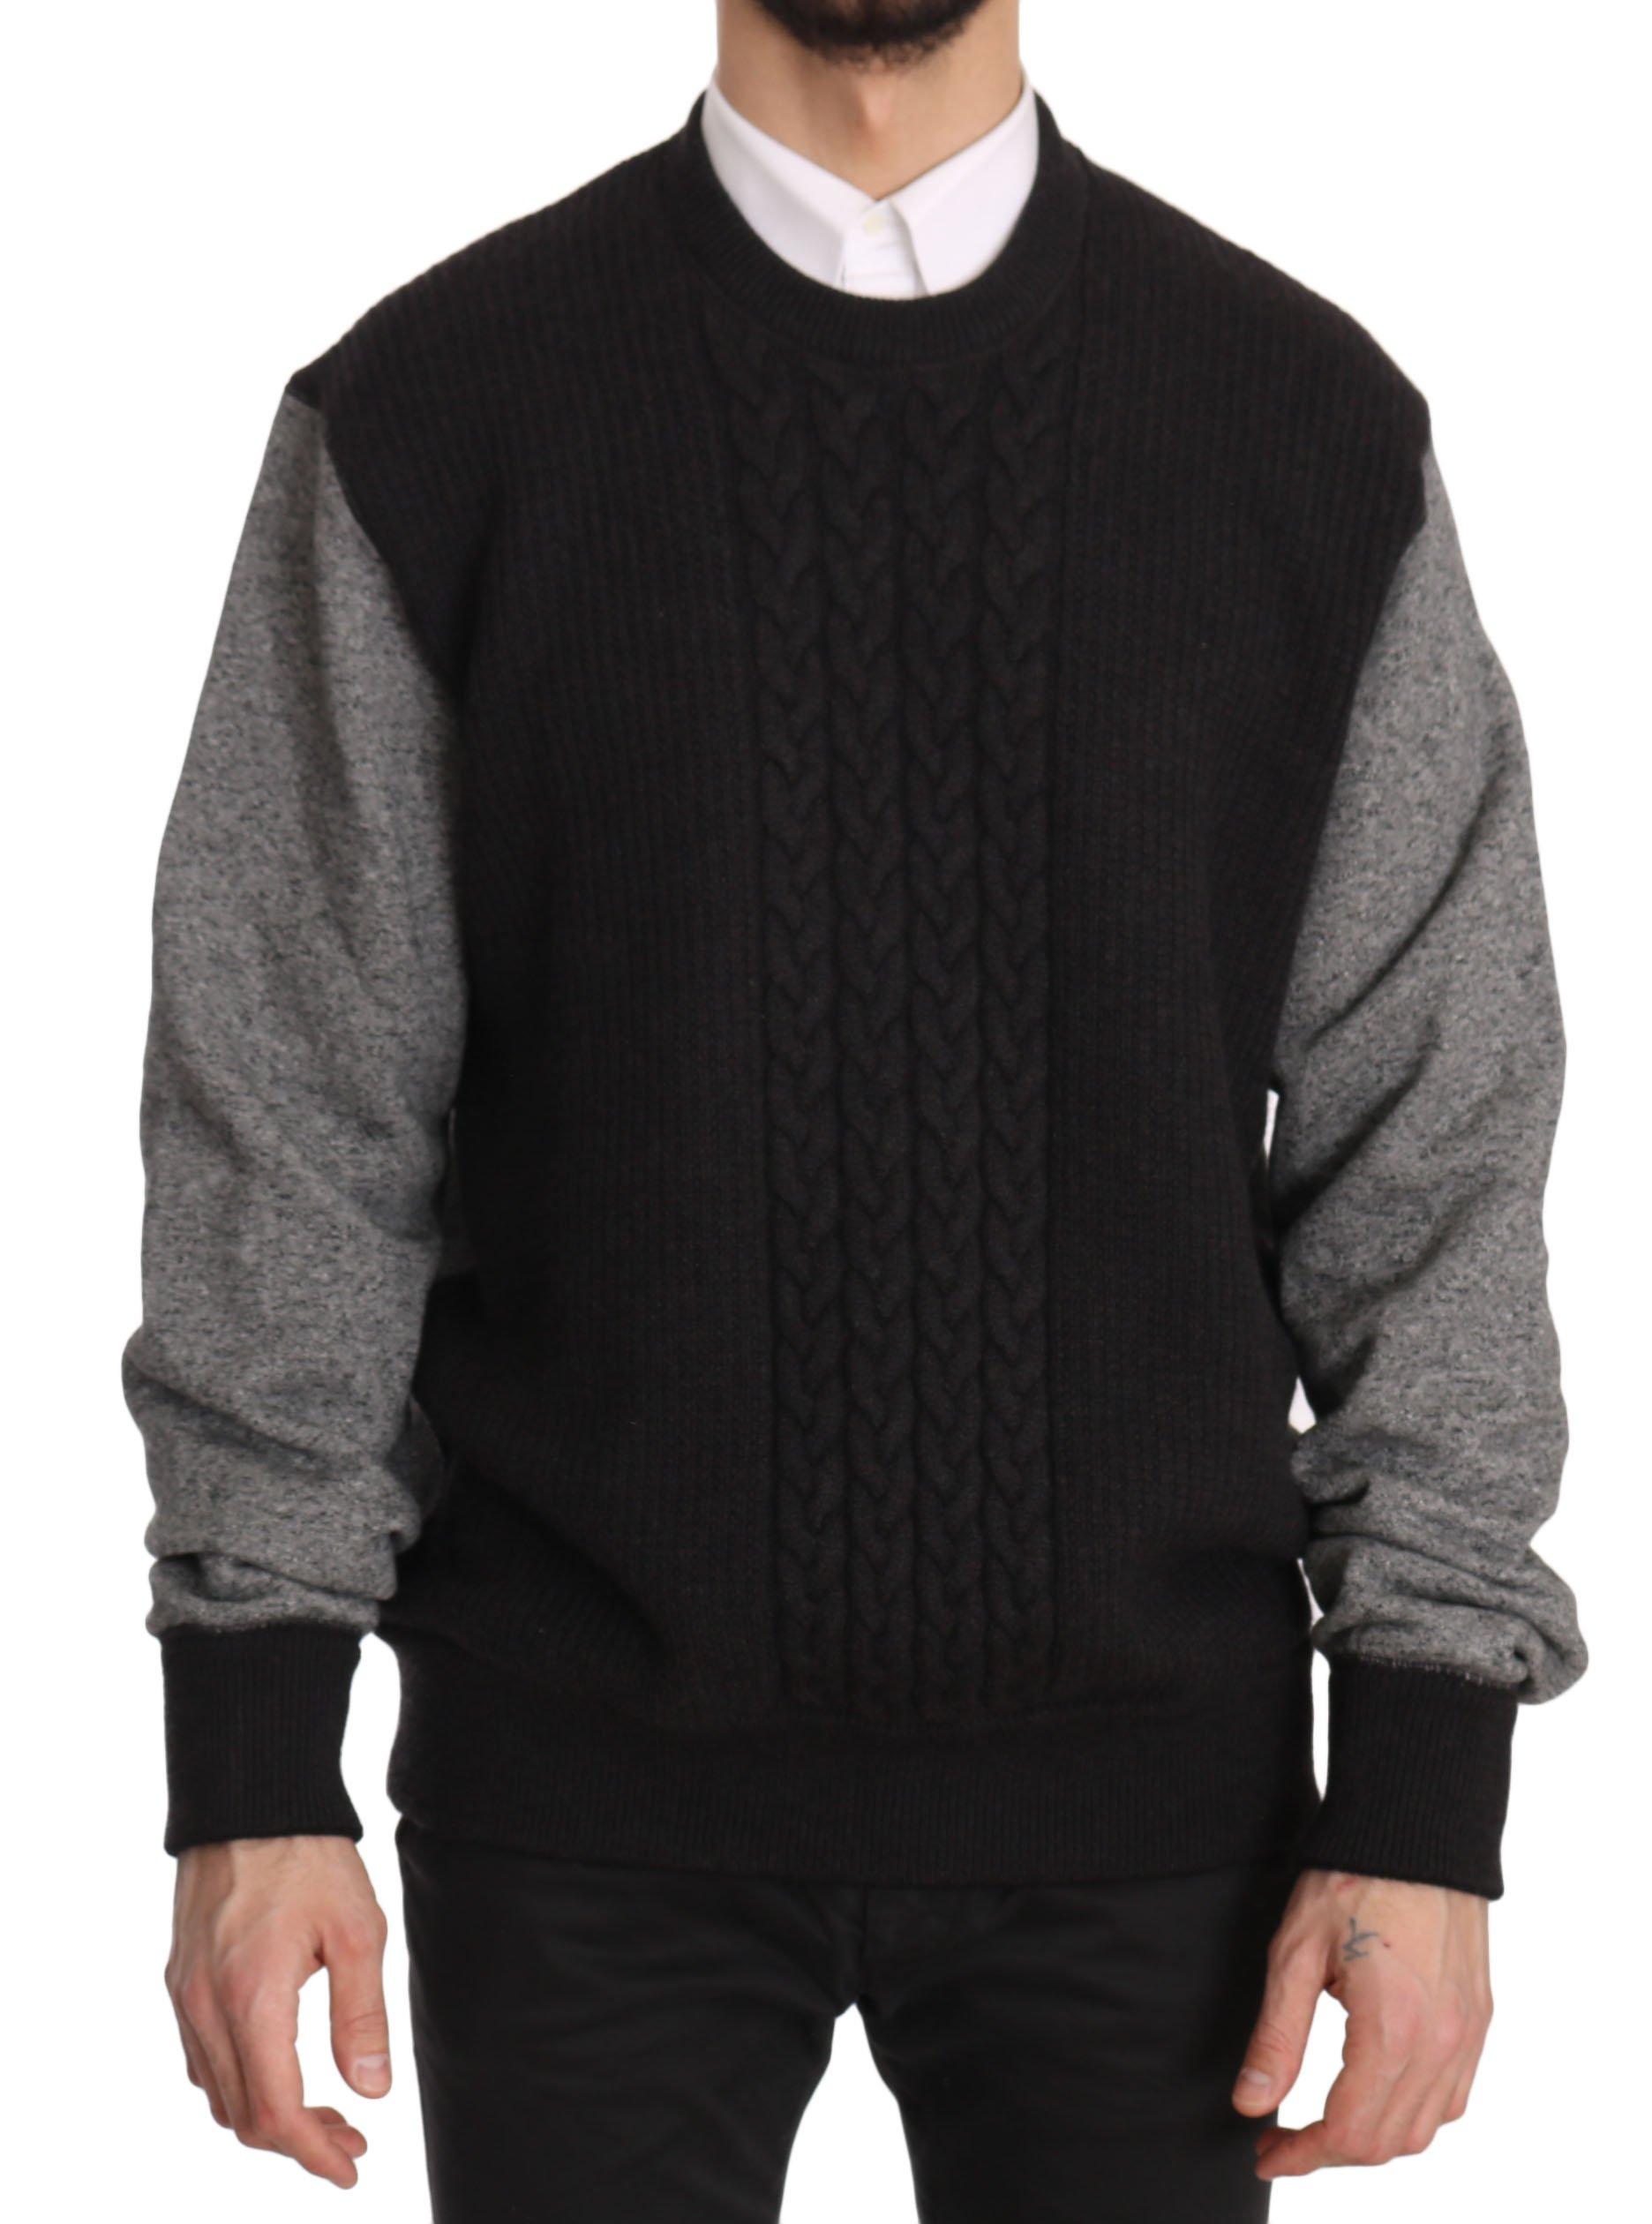 Dolce & Gabbana Men's Sweater Black and Gray TSH3581 - IT56   XXL